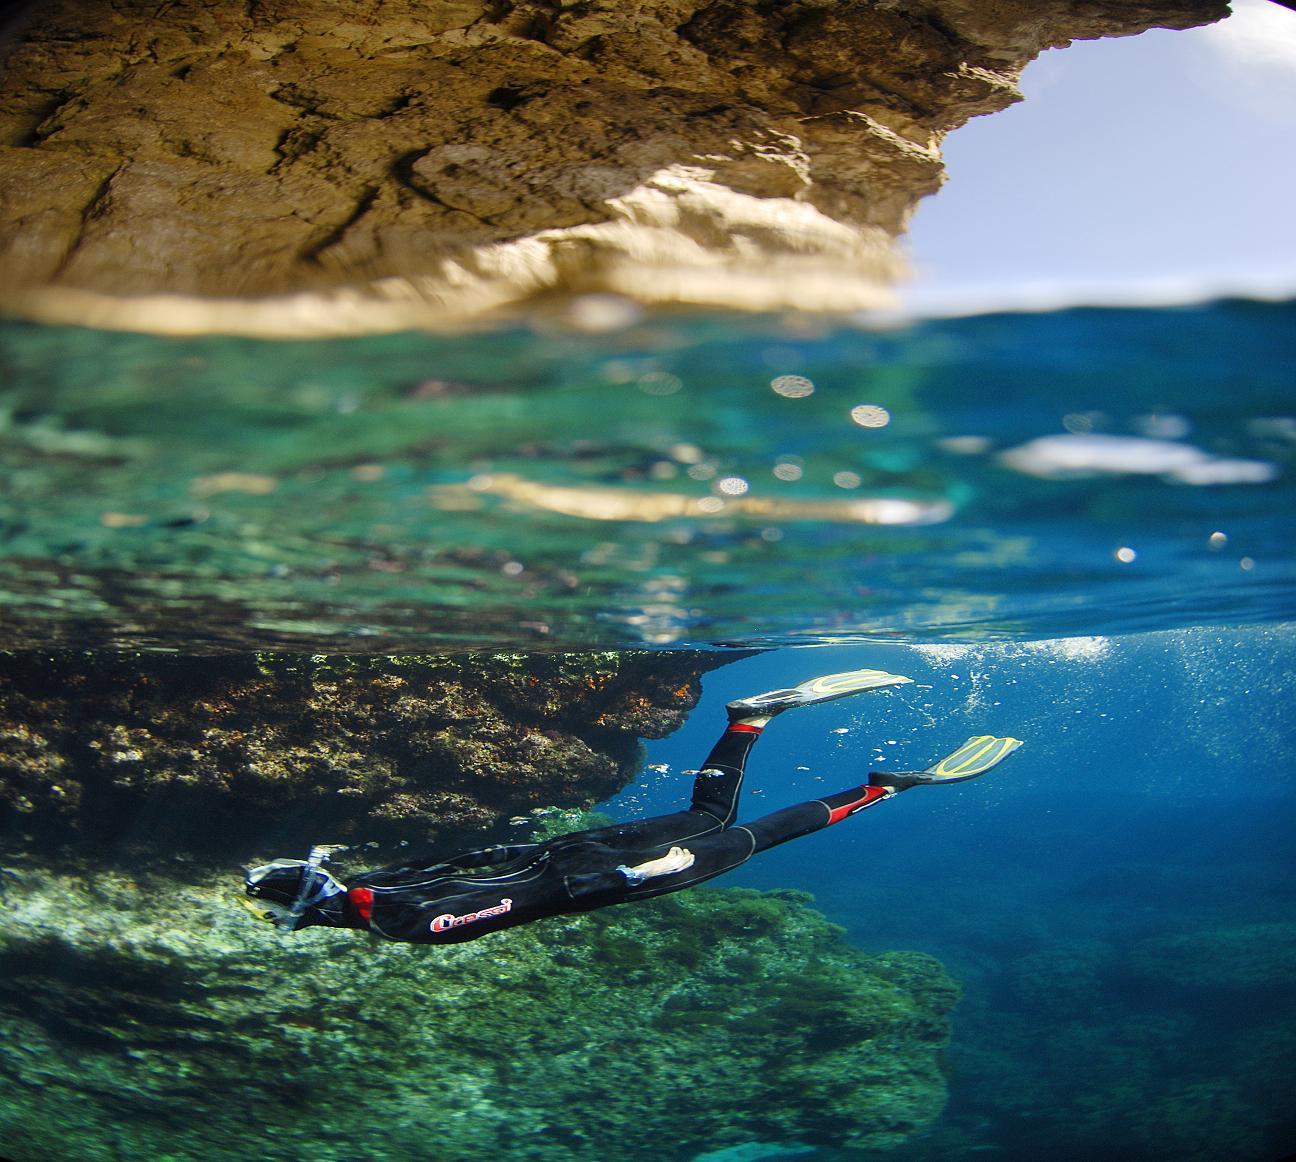 Snorkelling in Malta by Paolo Meitre Liberatini